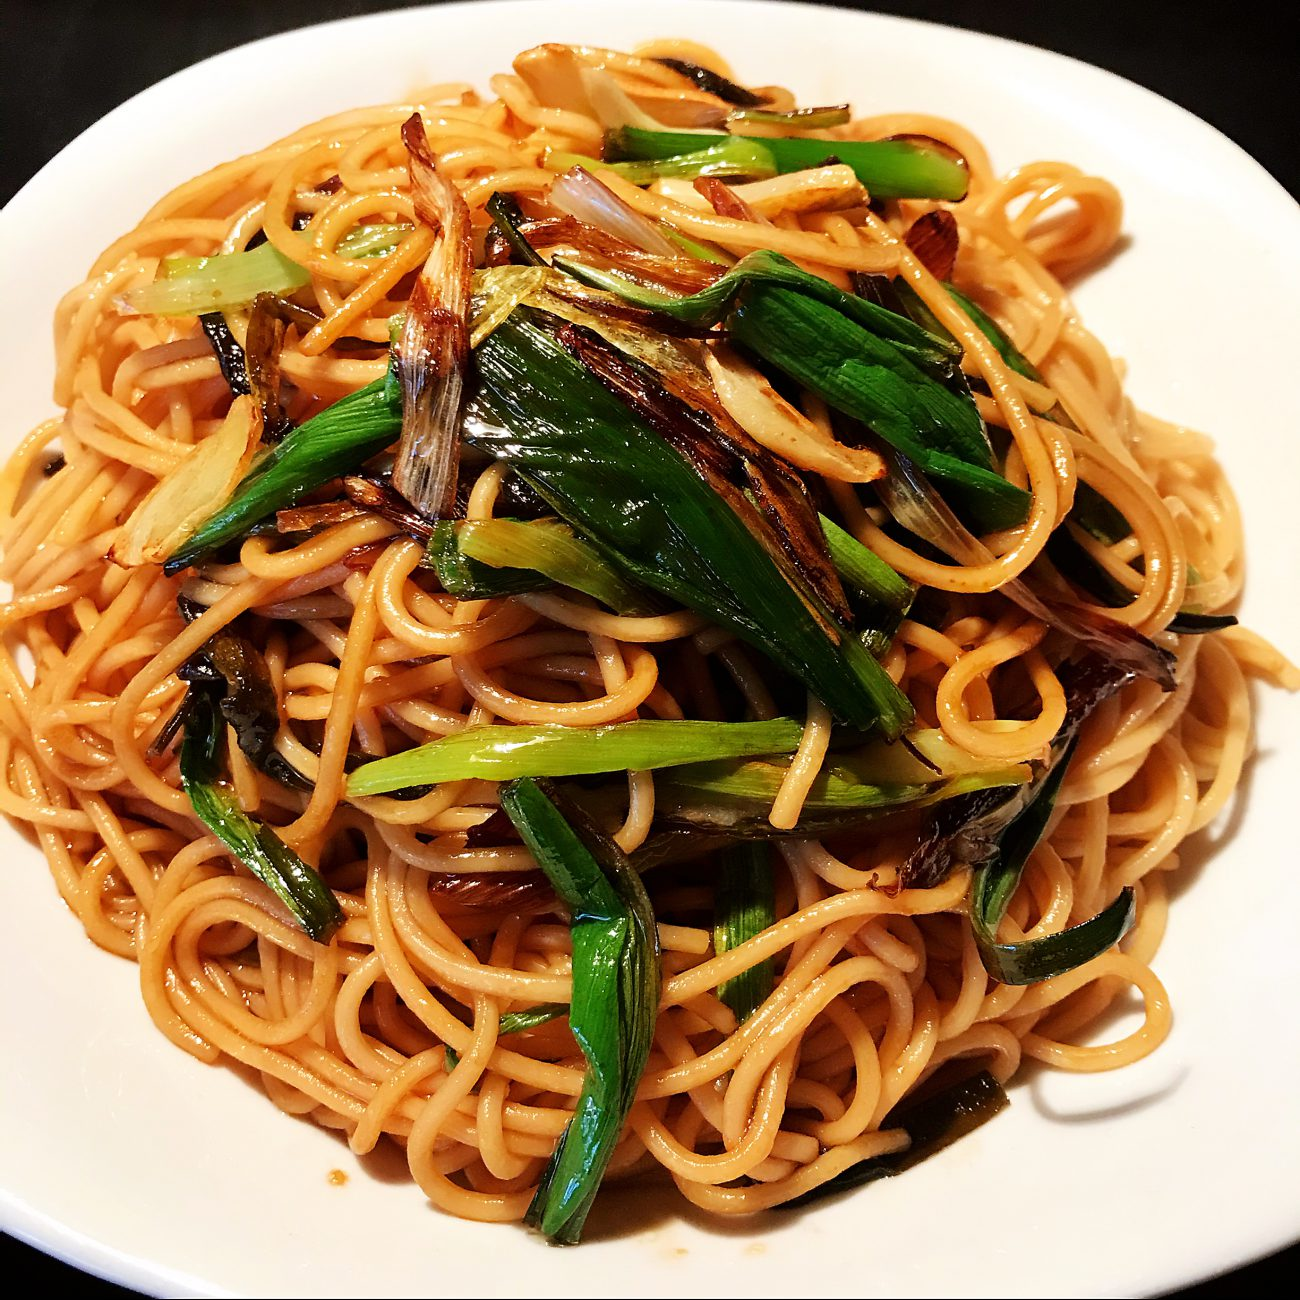 Scallion flavored noodles